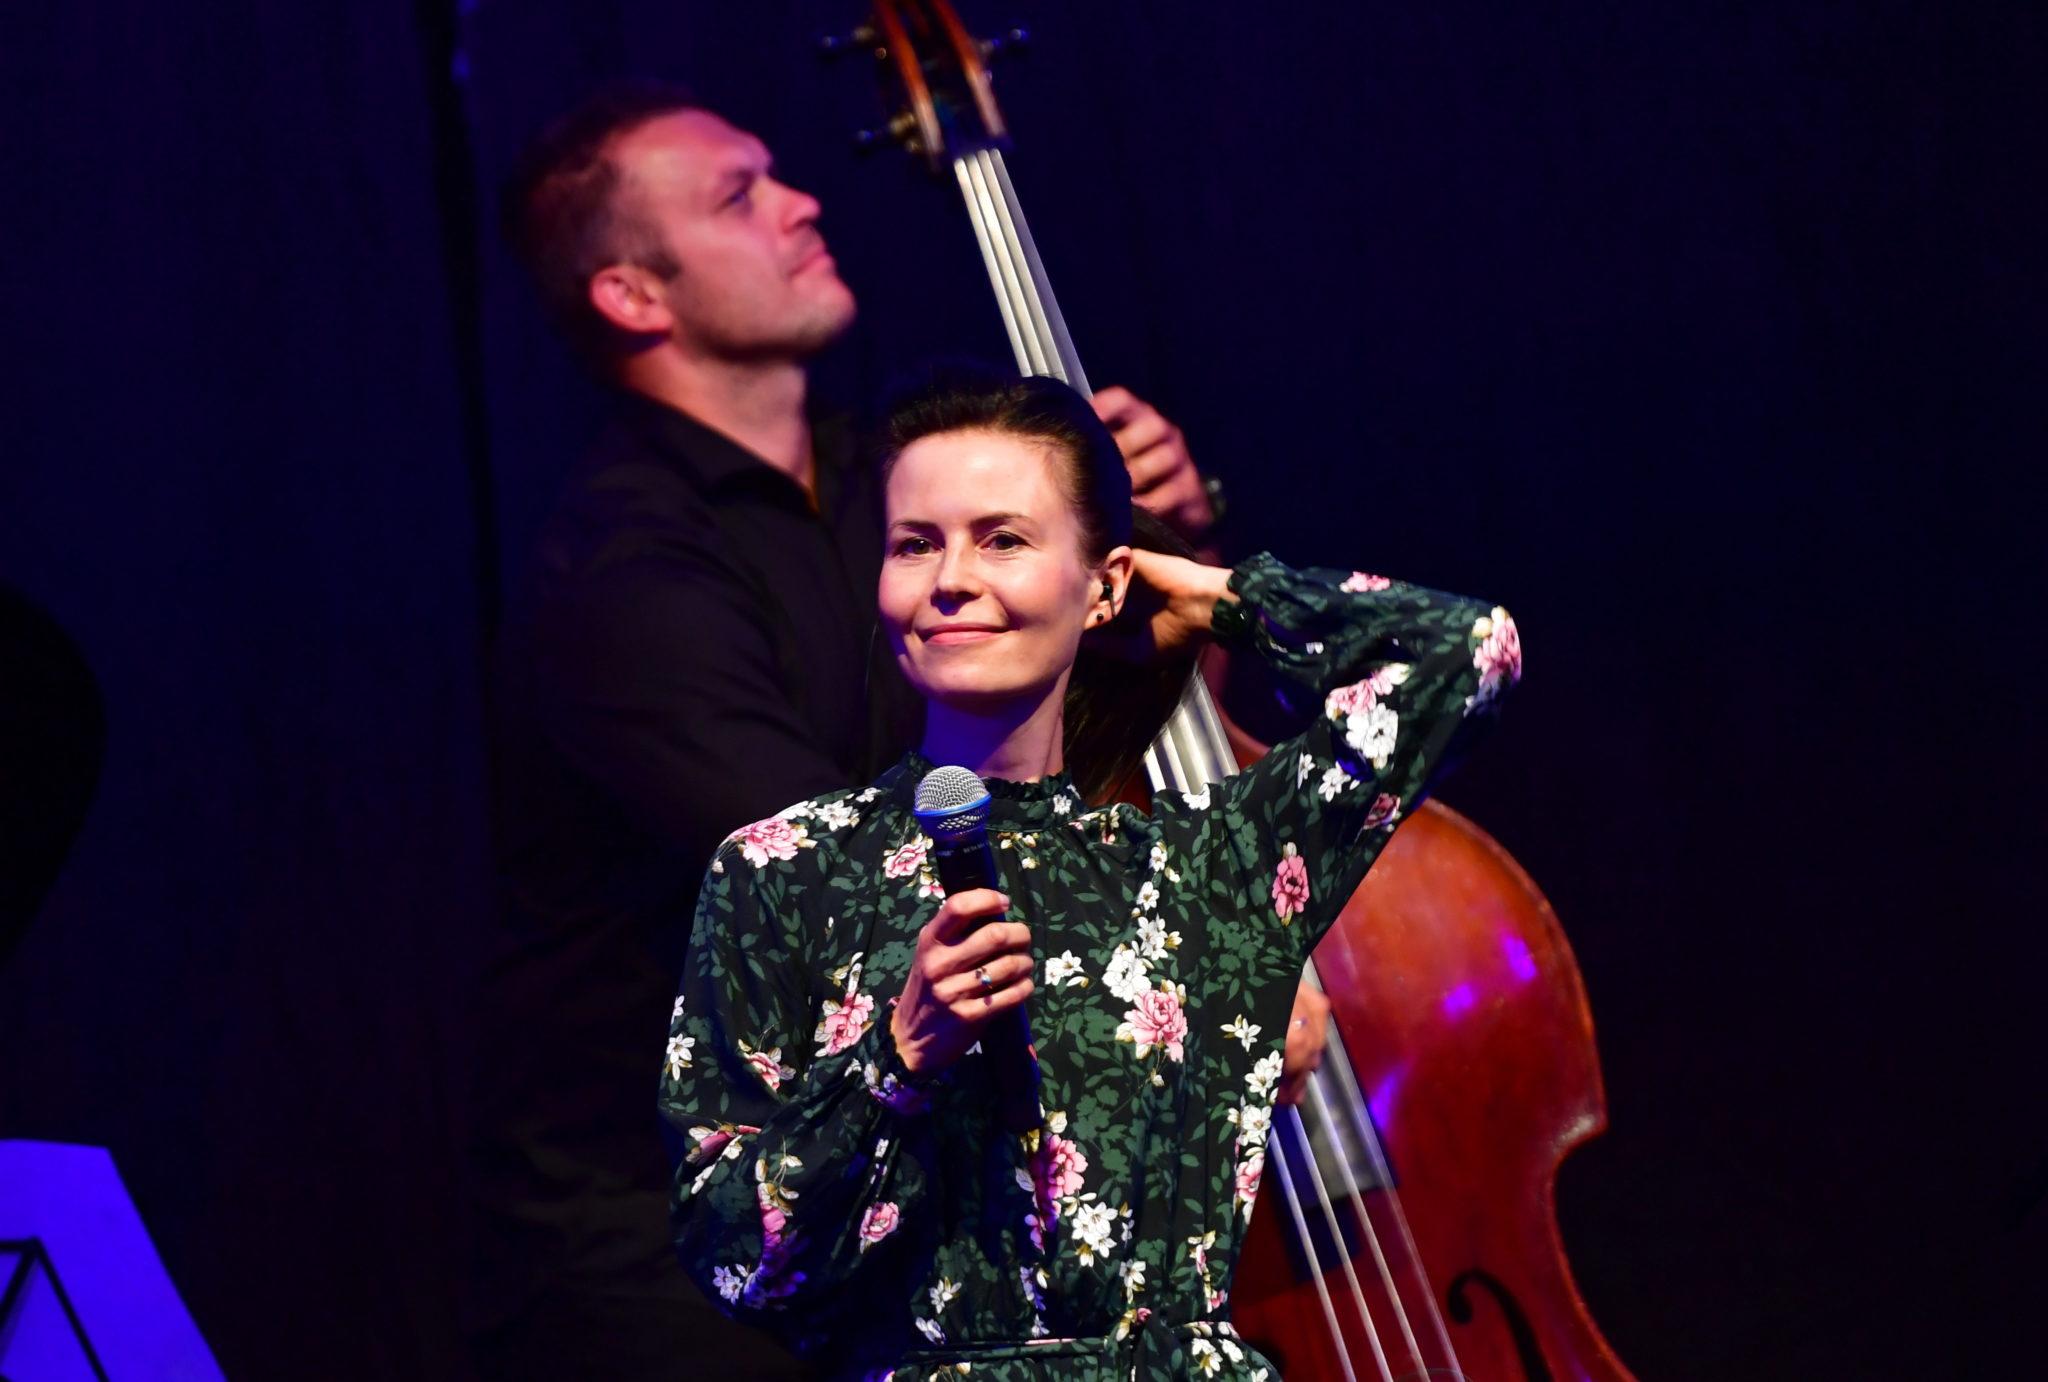 Koncert Magdaleny Kumorek z zespołem Tubis Trio